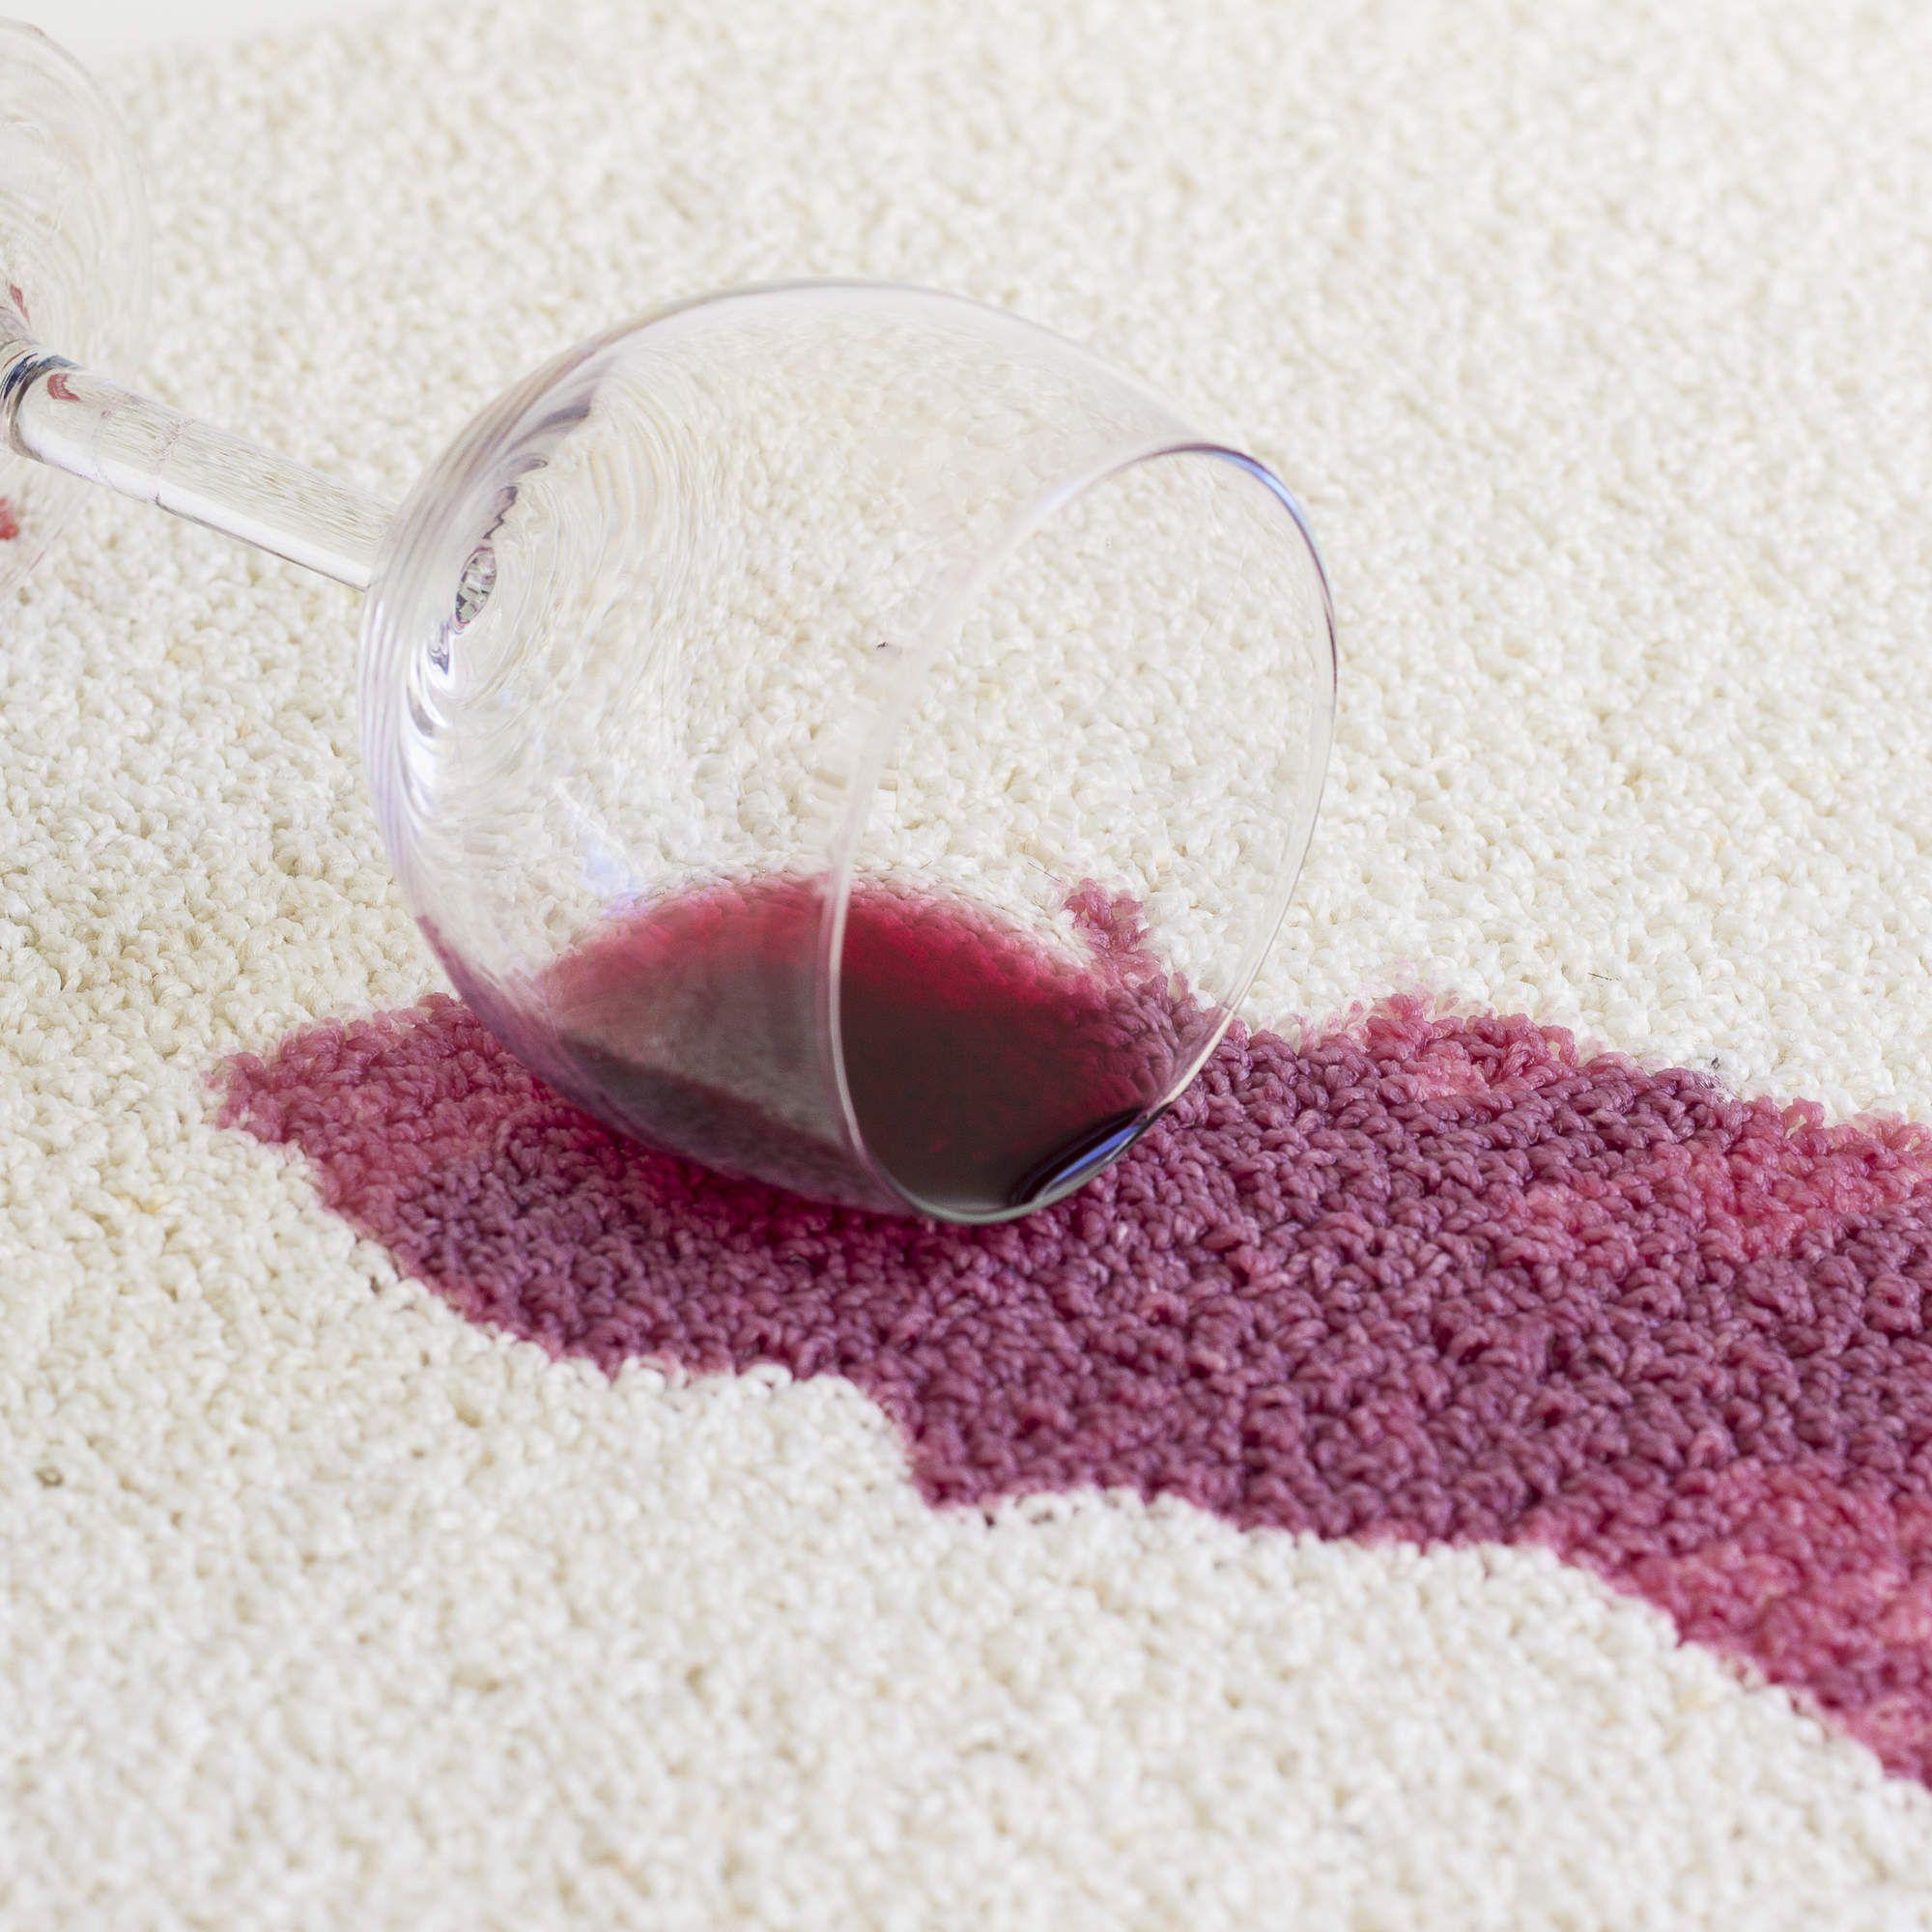 7 Ways To Remove A Red Wine Stain ~ Como Quitar Las Manchas De Vino Tinto